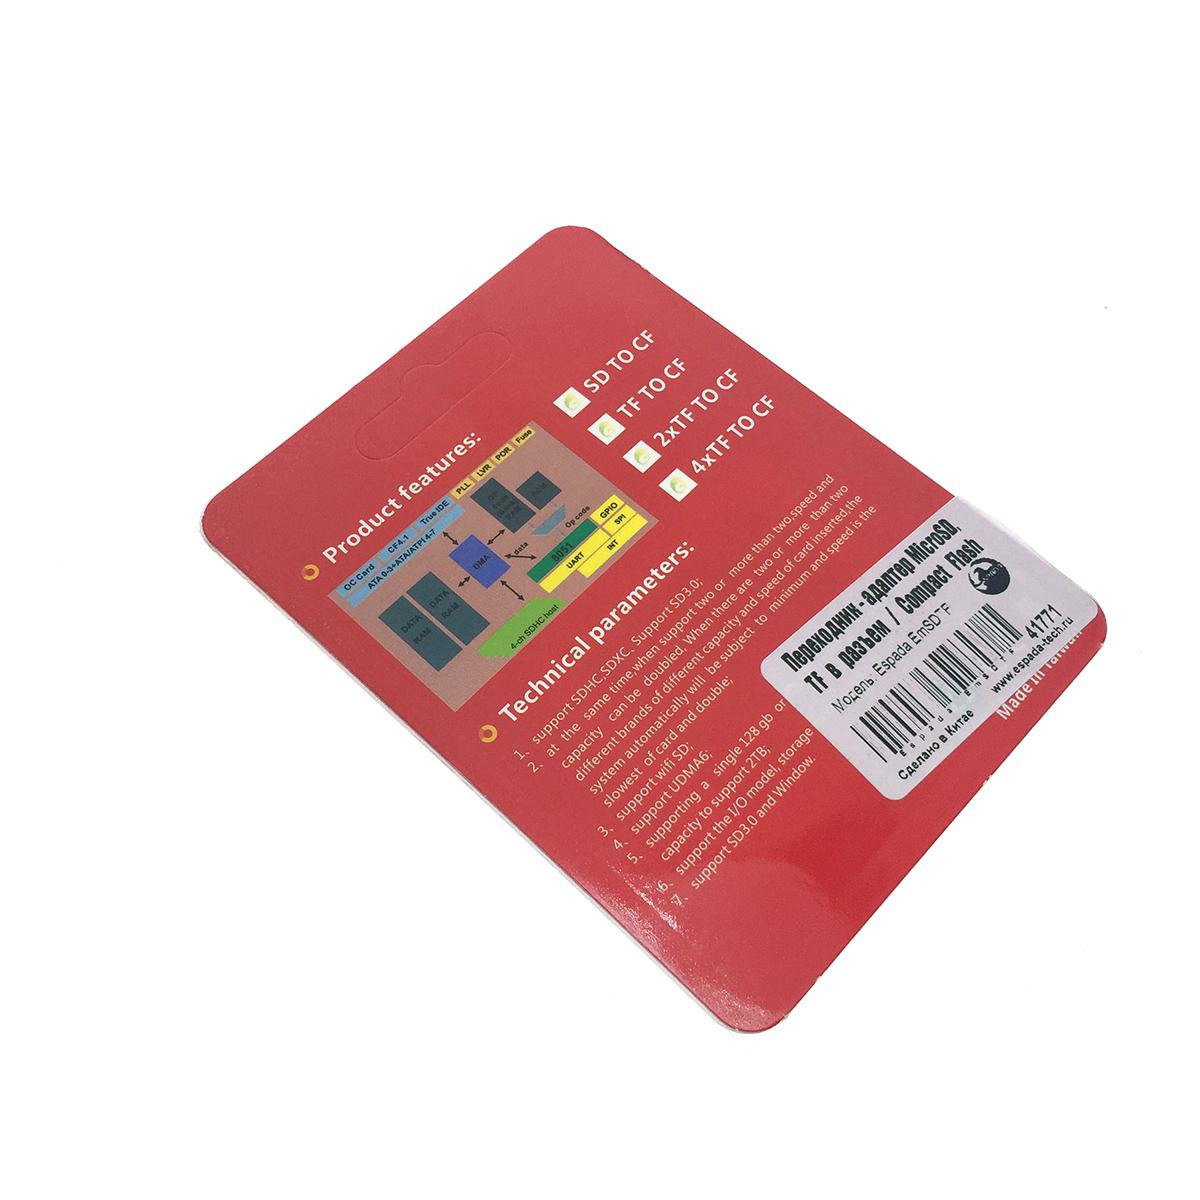 Переходник - адаптер MicroSD, TF в разъем Compact Flash, Espada EmSDTF